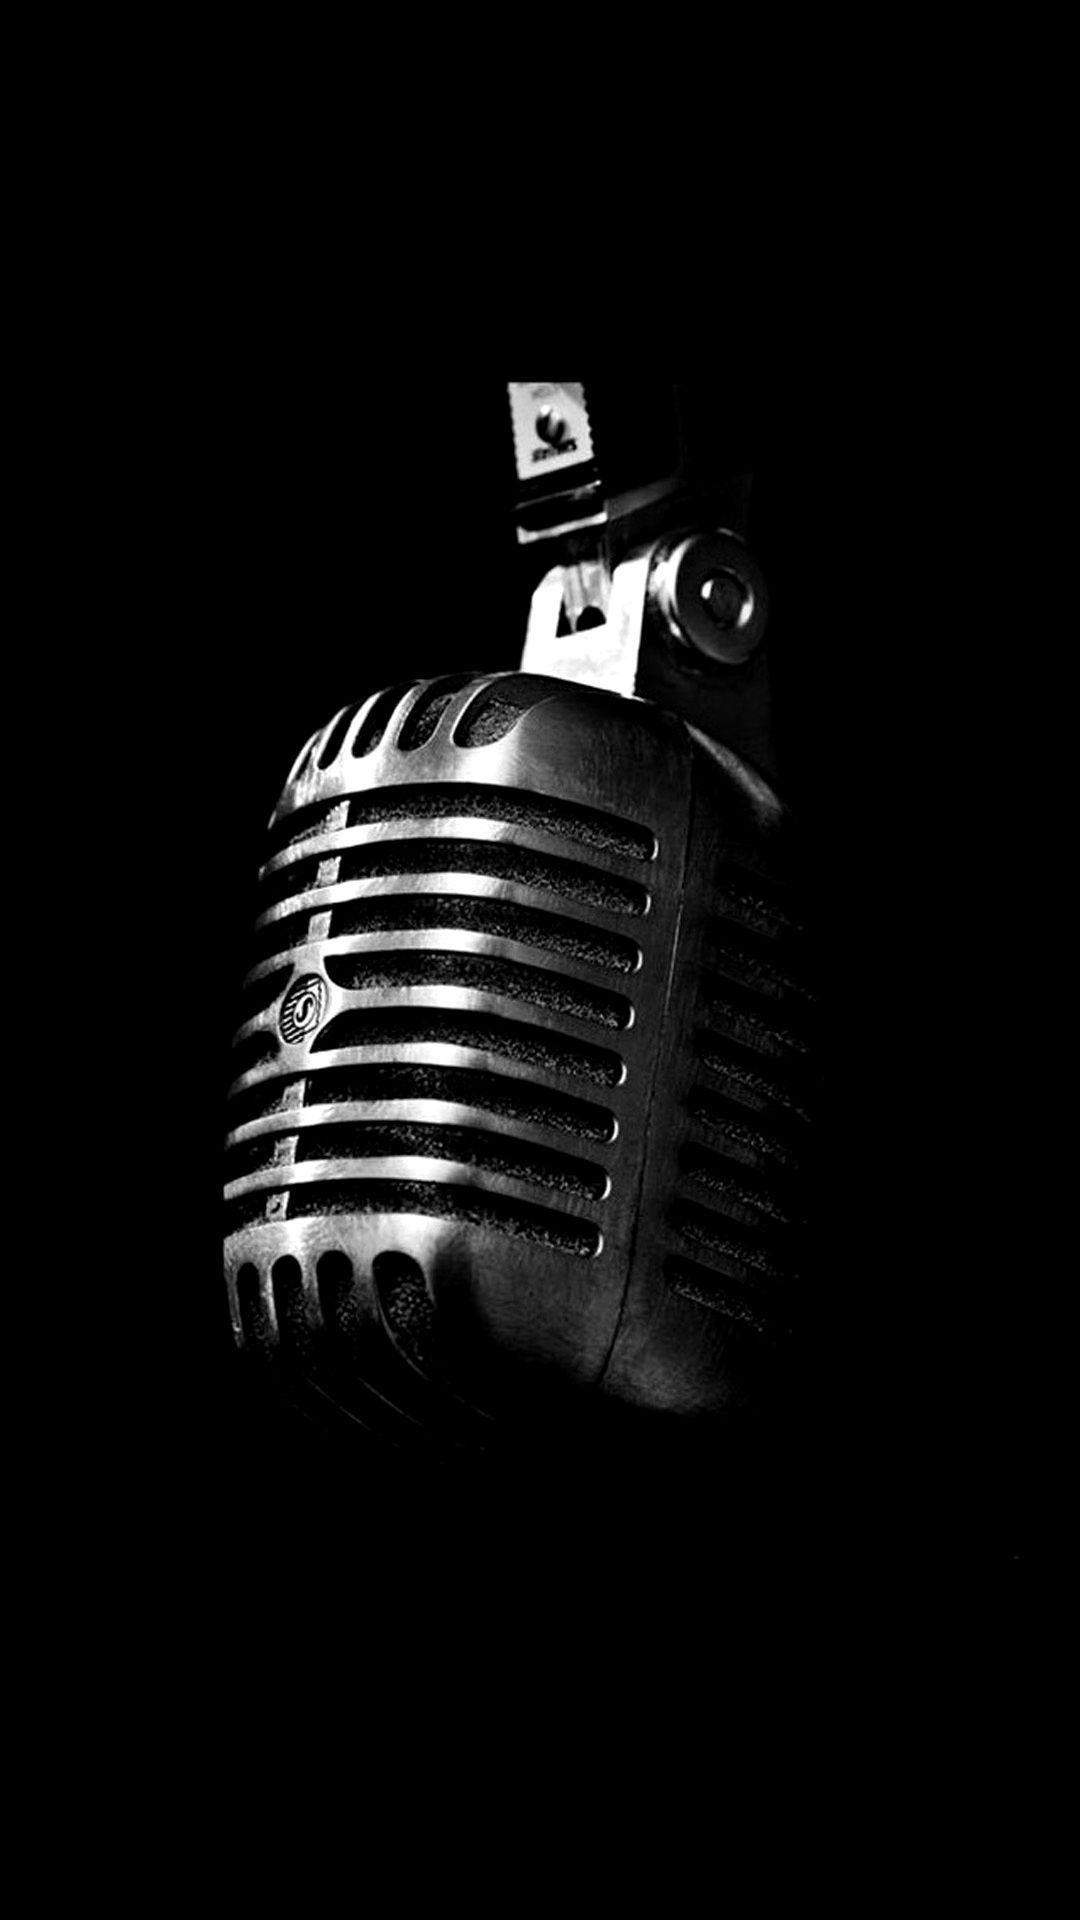 Dark Music Wallpaper 4k Trick Music Wallpaper Black And White Iphone 6 Plus Wallpaper Music Wallpaper Music Backgrounds